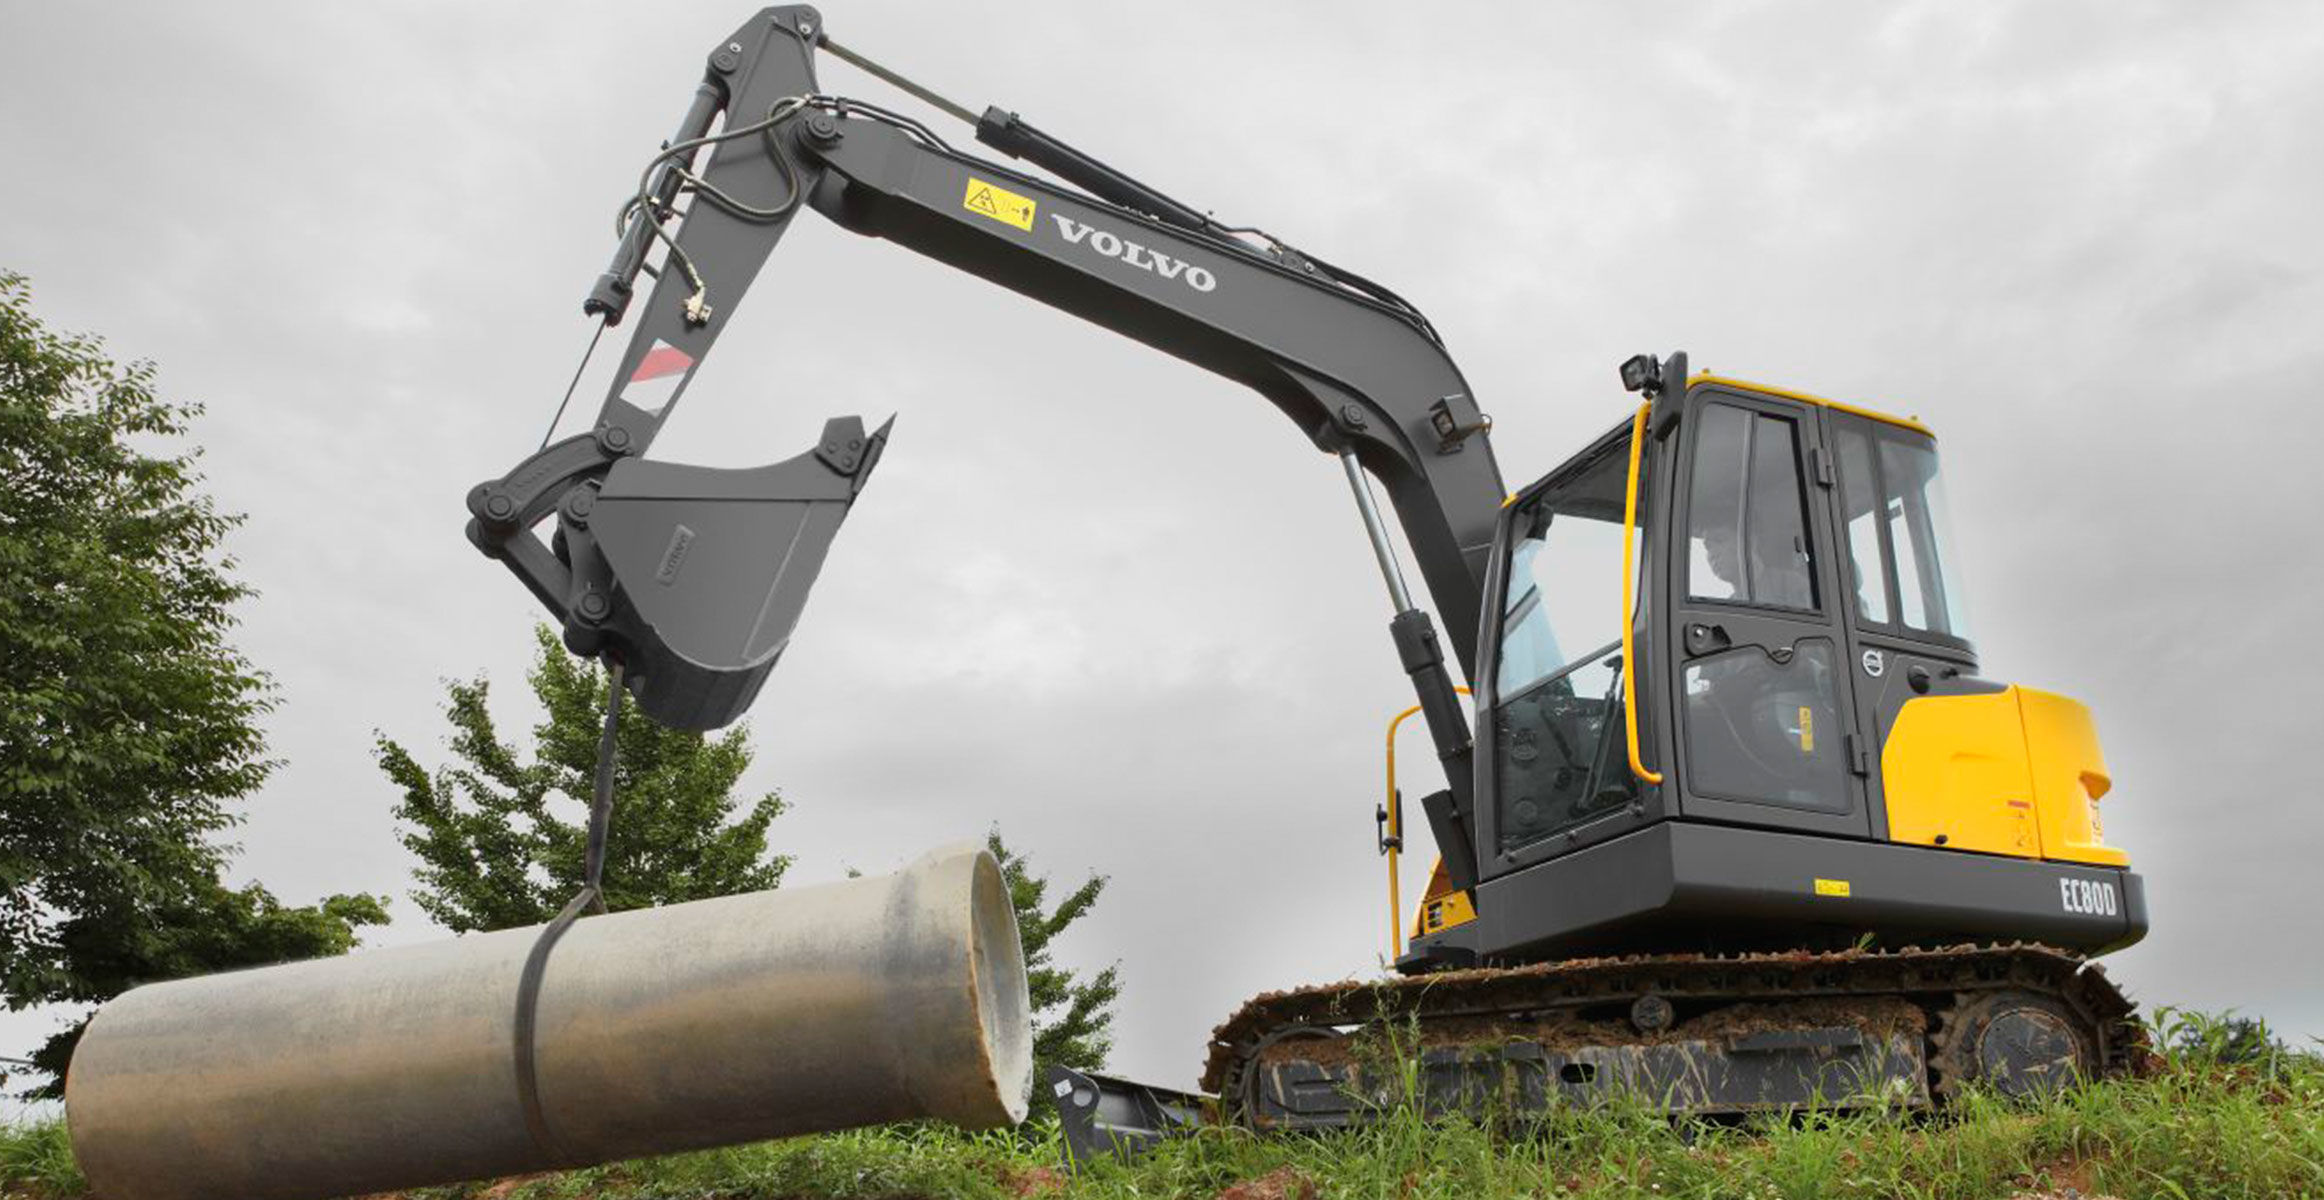 Volvo Ec80d The Biggest Excavator In Its Class Volvo Construction Equipment